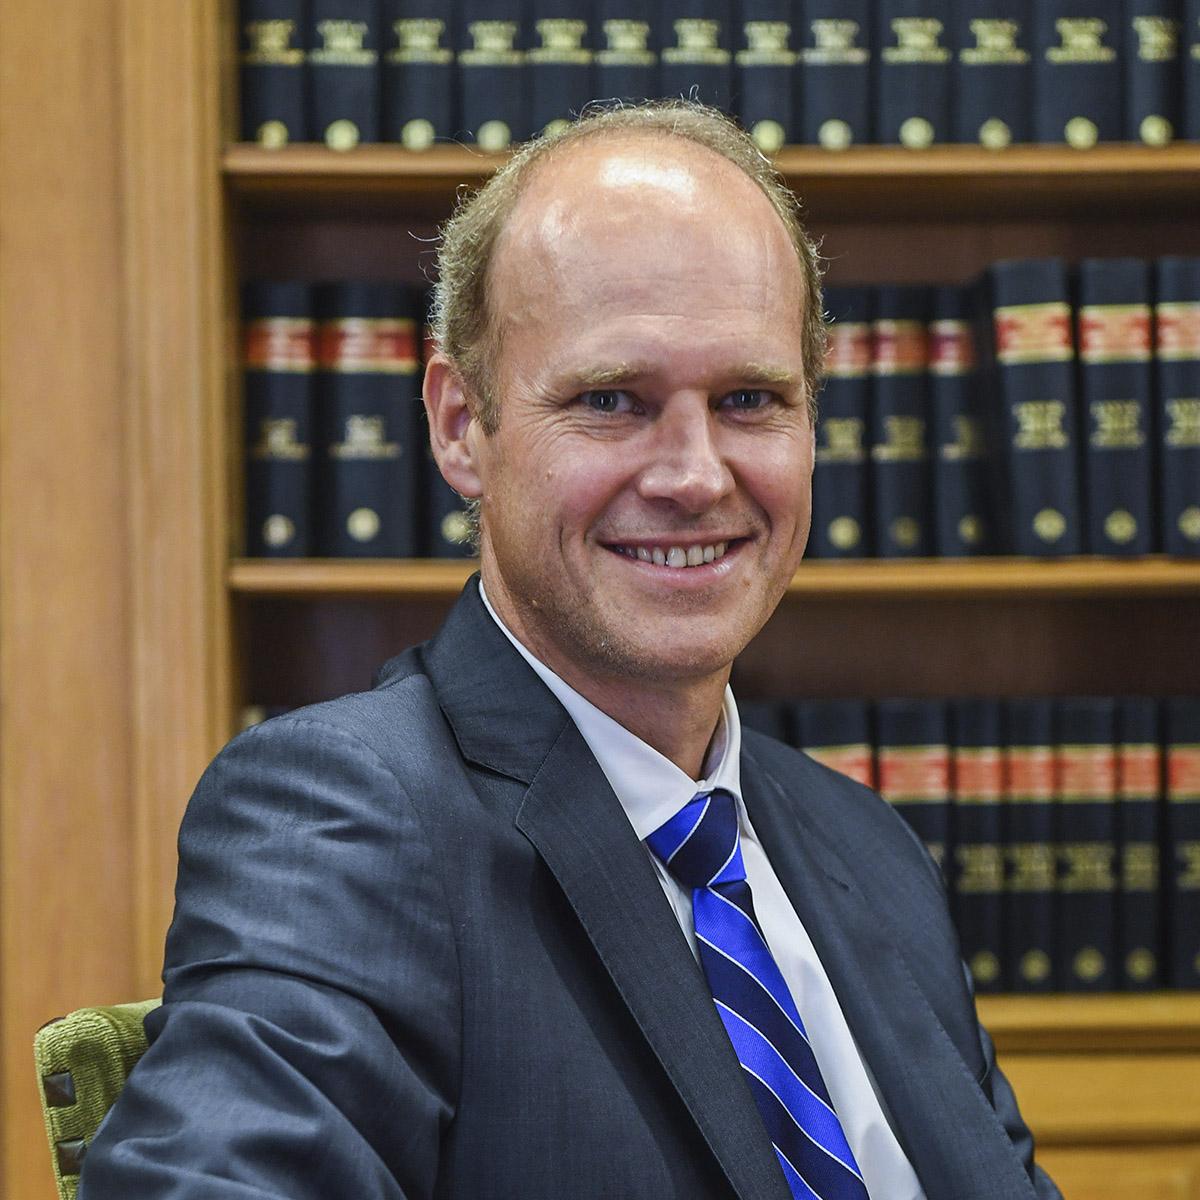 Javier Bolzico